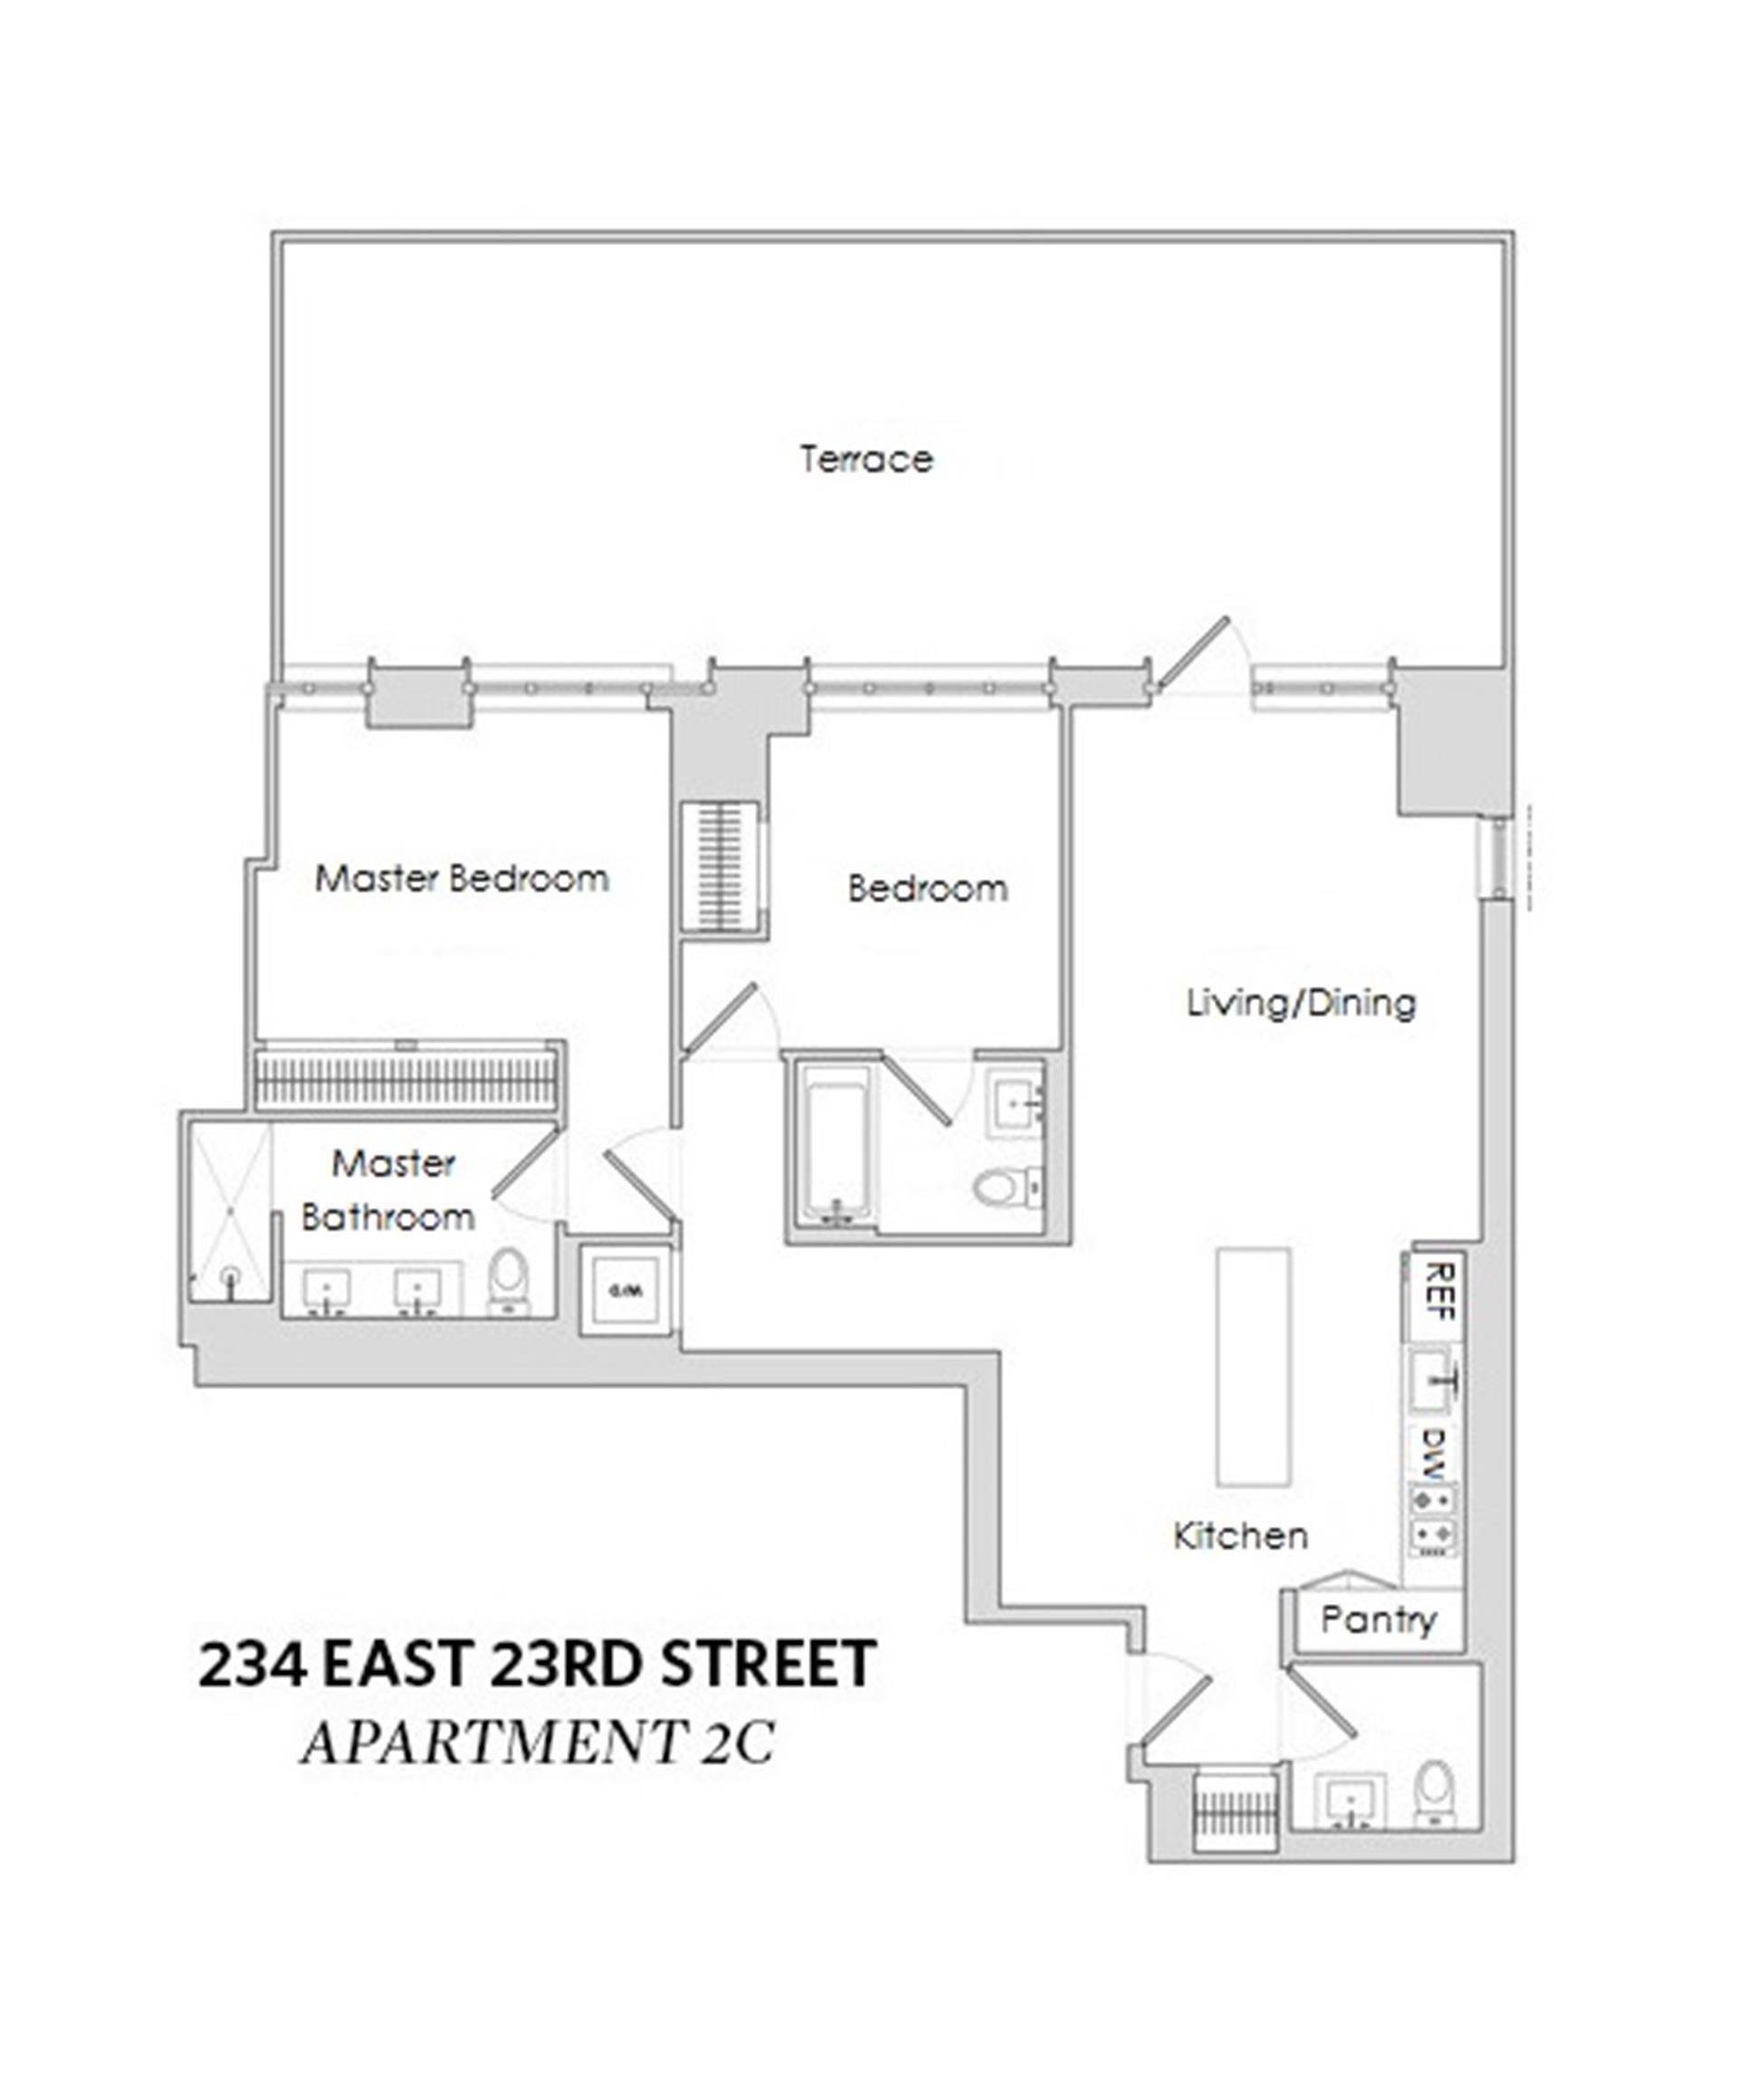 Floor plan of 234 East 23rd St, 2C - Gramercy - Union Square, New York